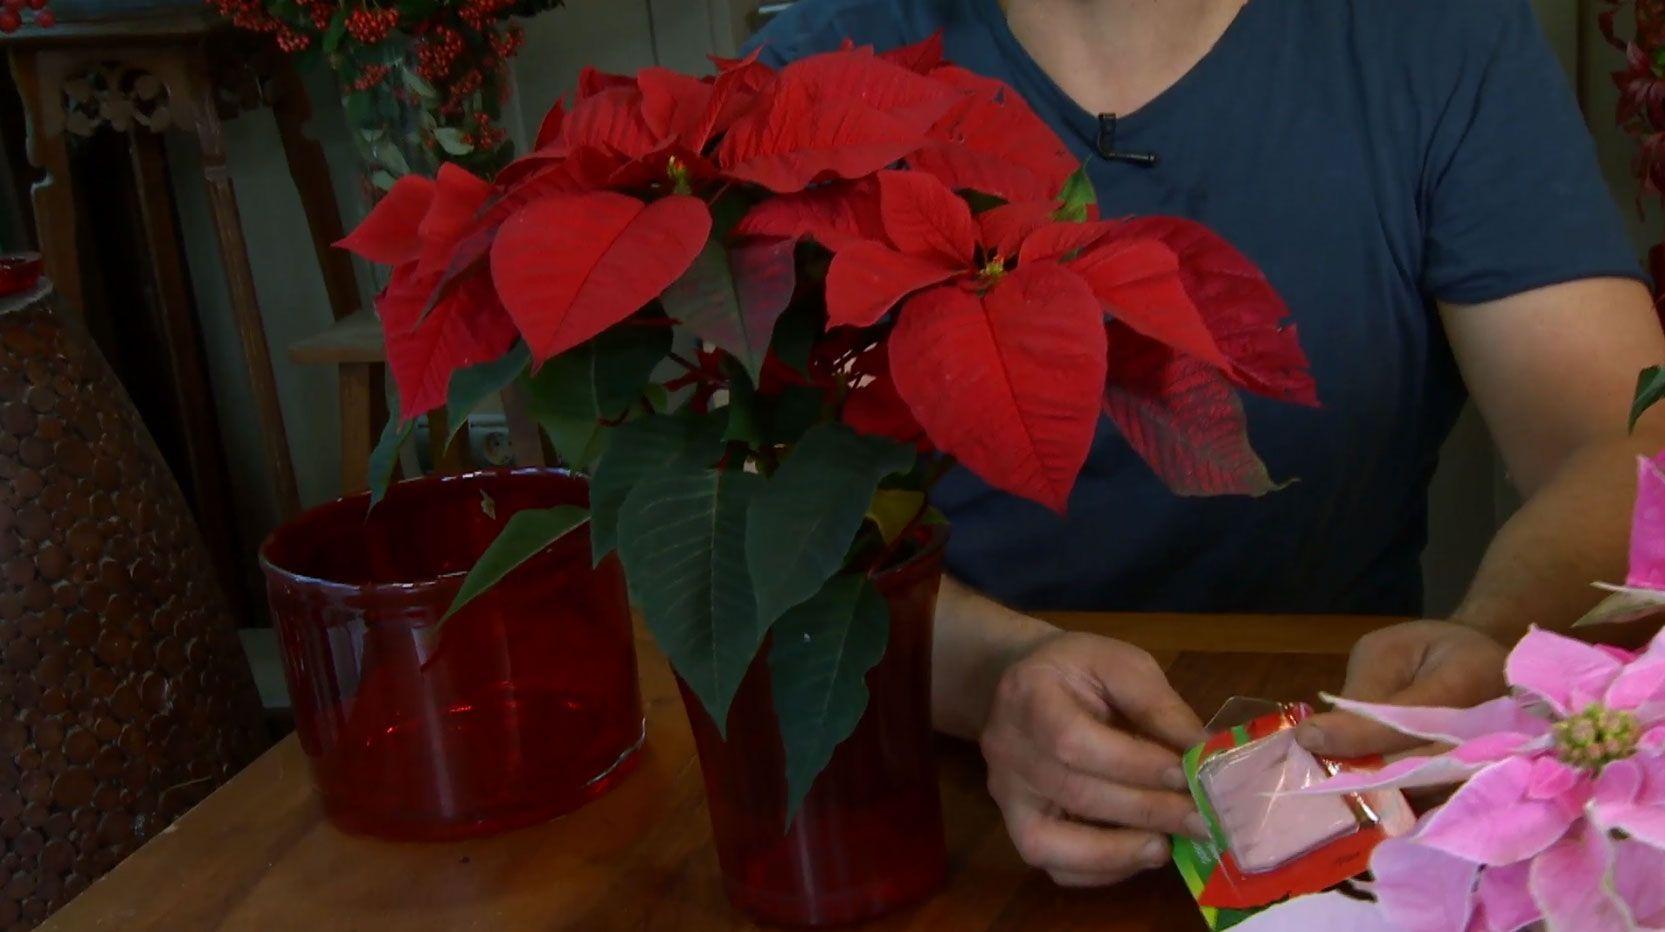 arreglo floral con flor de pascua